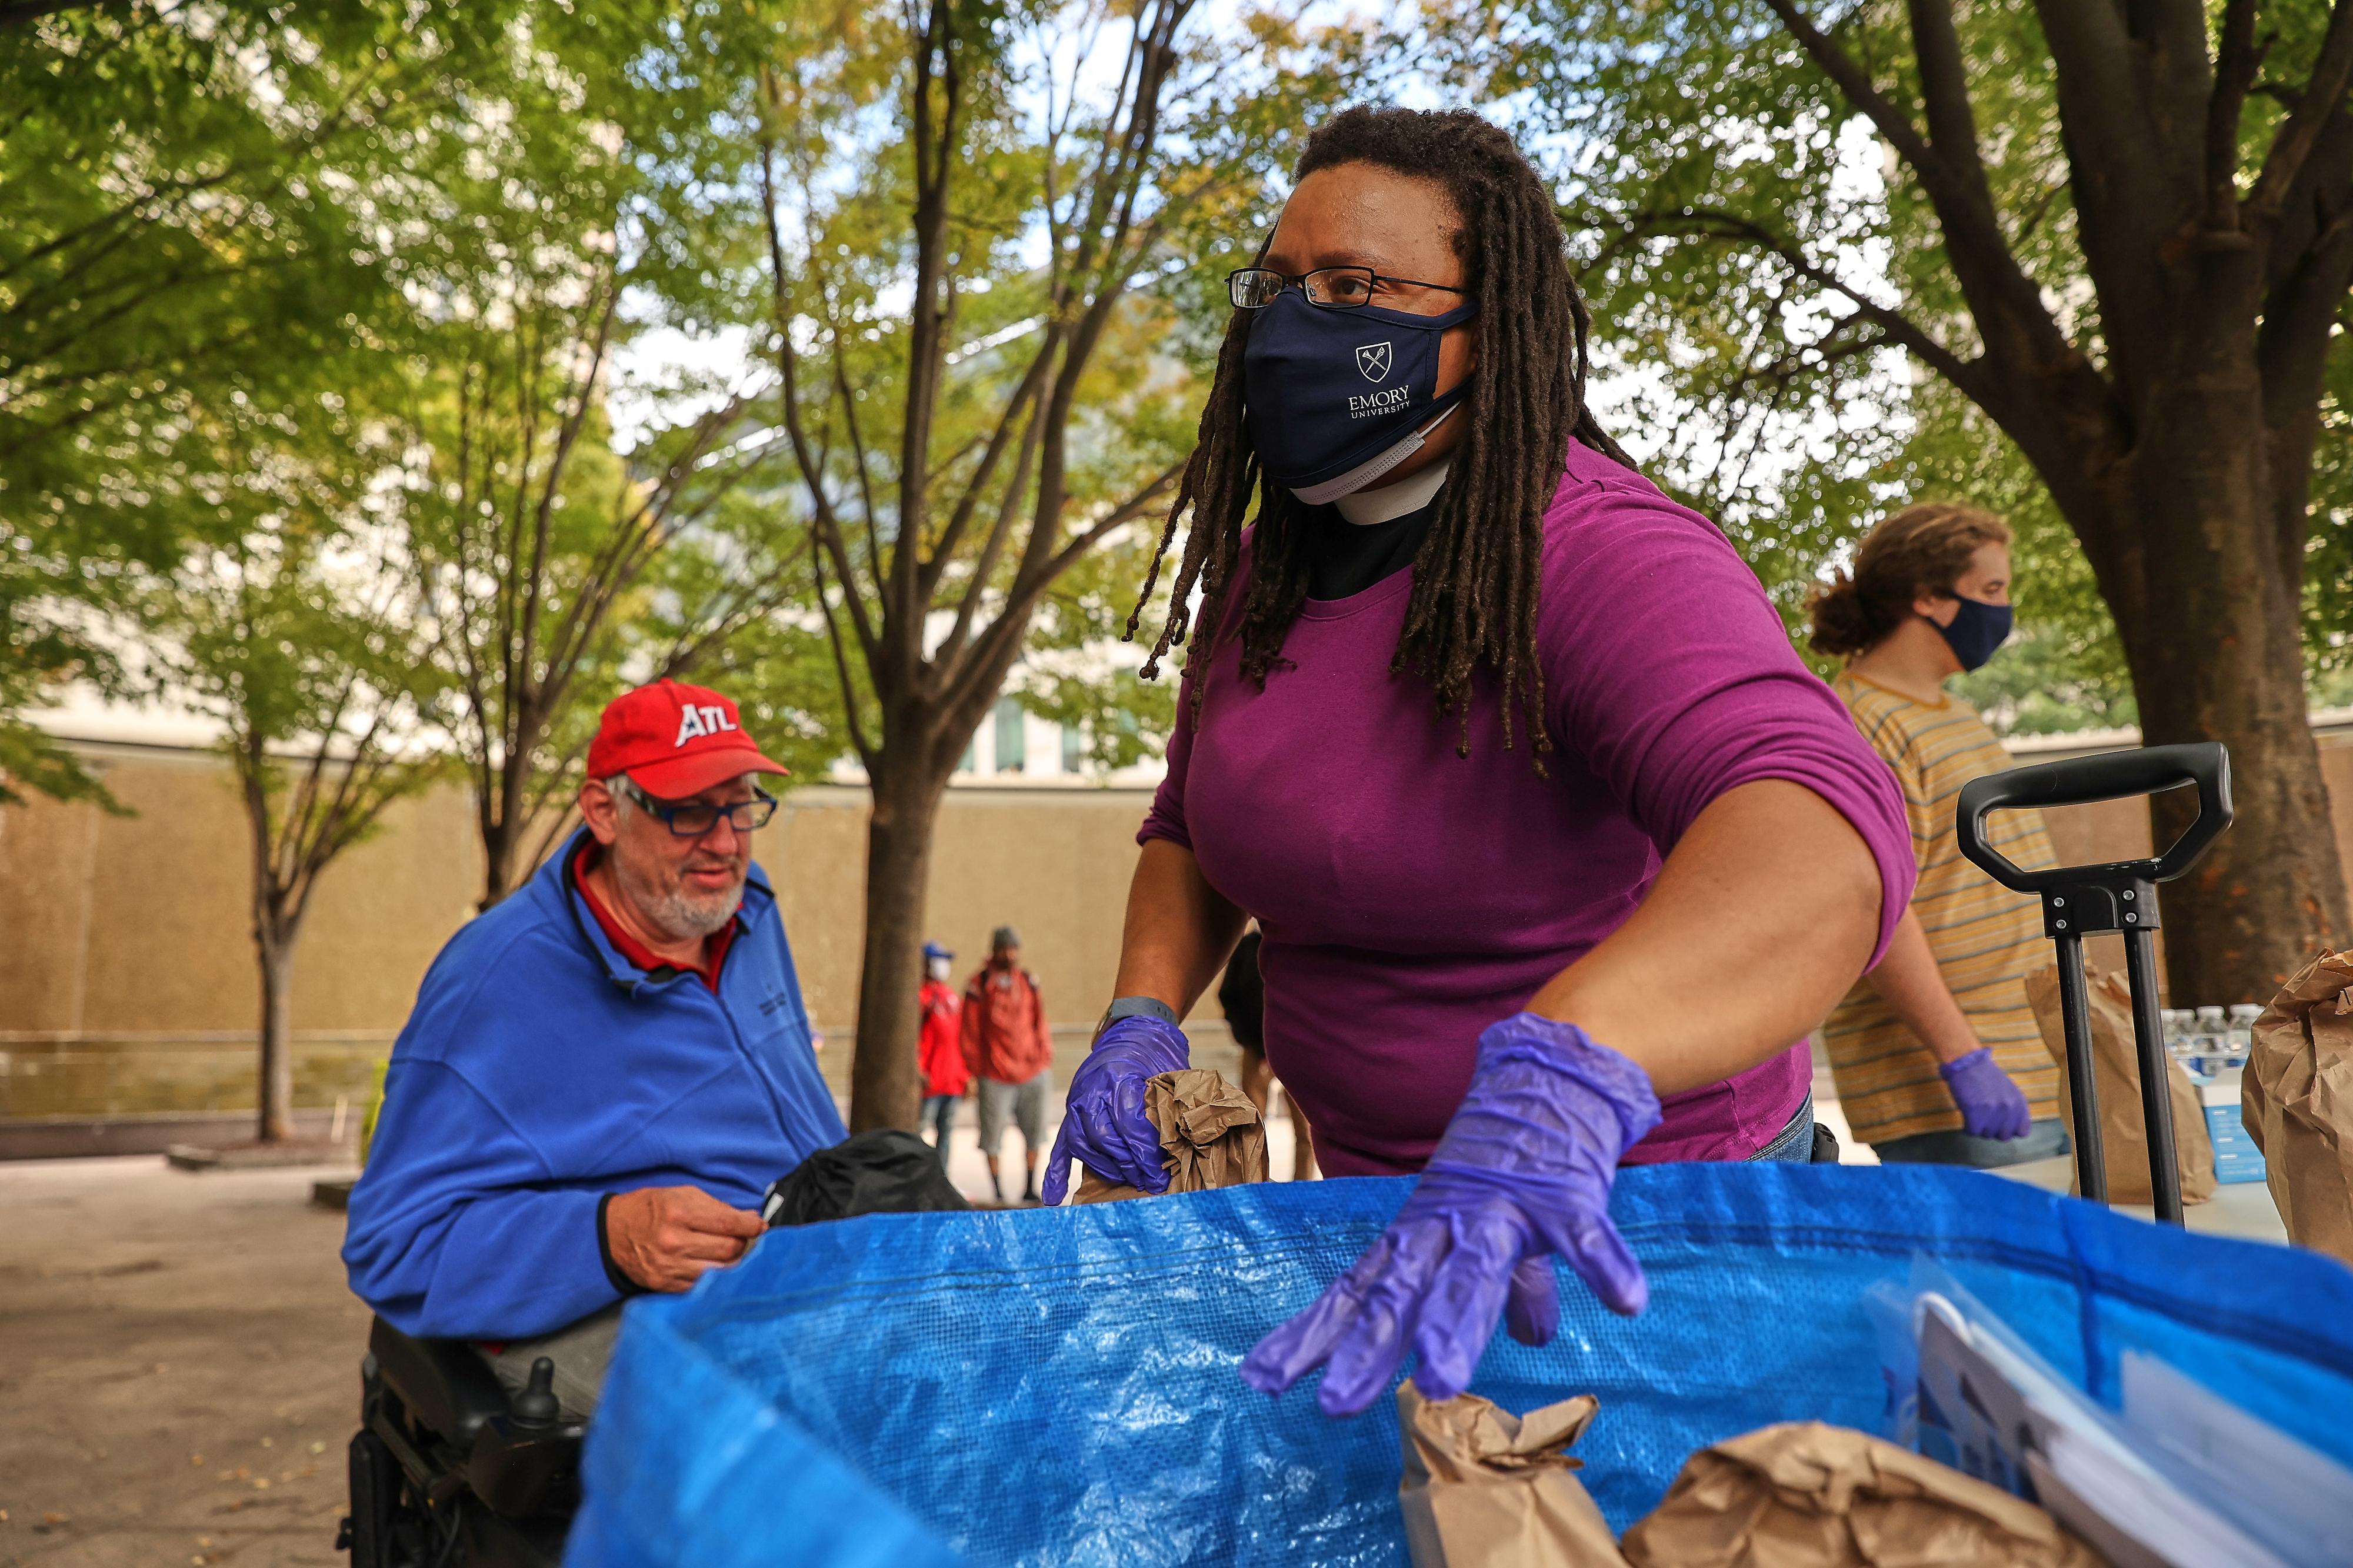 The Rev. Kim Jackson feeds the homeless at Woodruff Park in Atlanta, Georgia, on Sunday, Oct. 18, 2020.